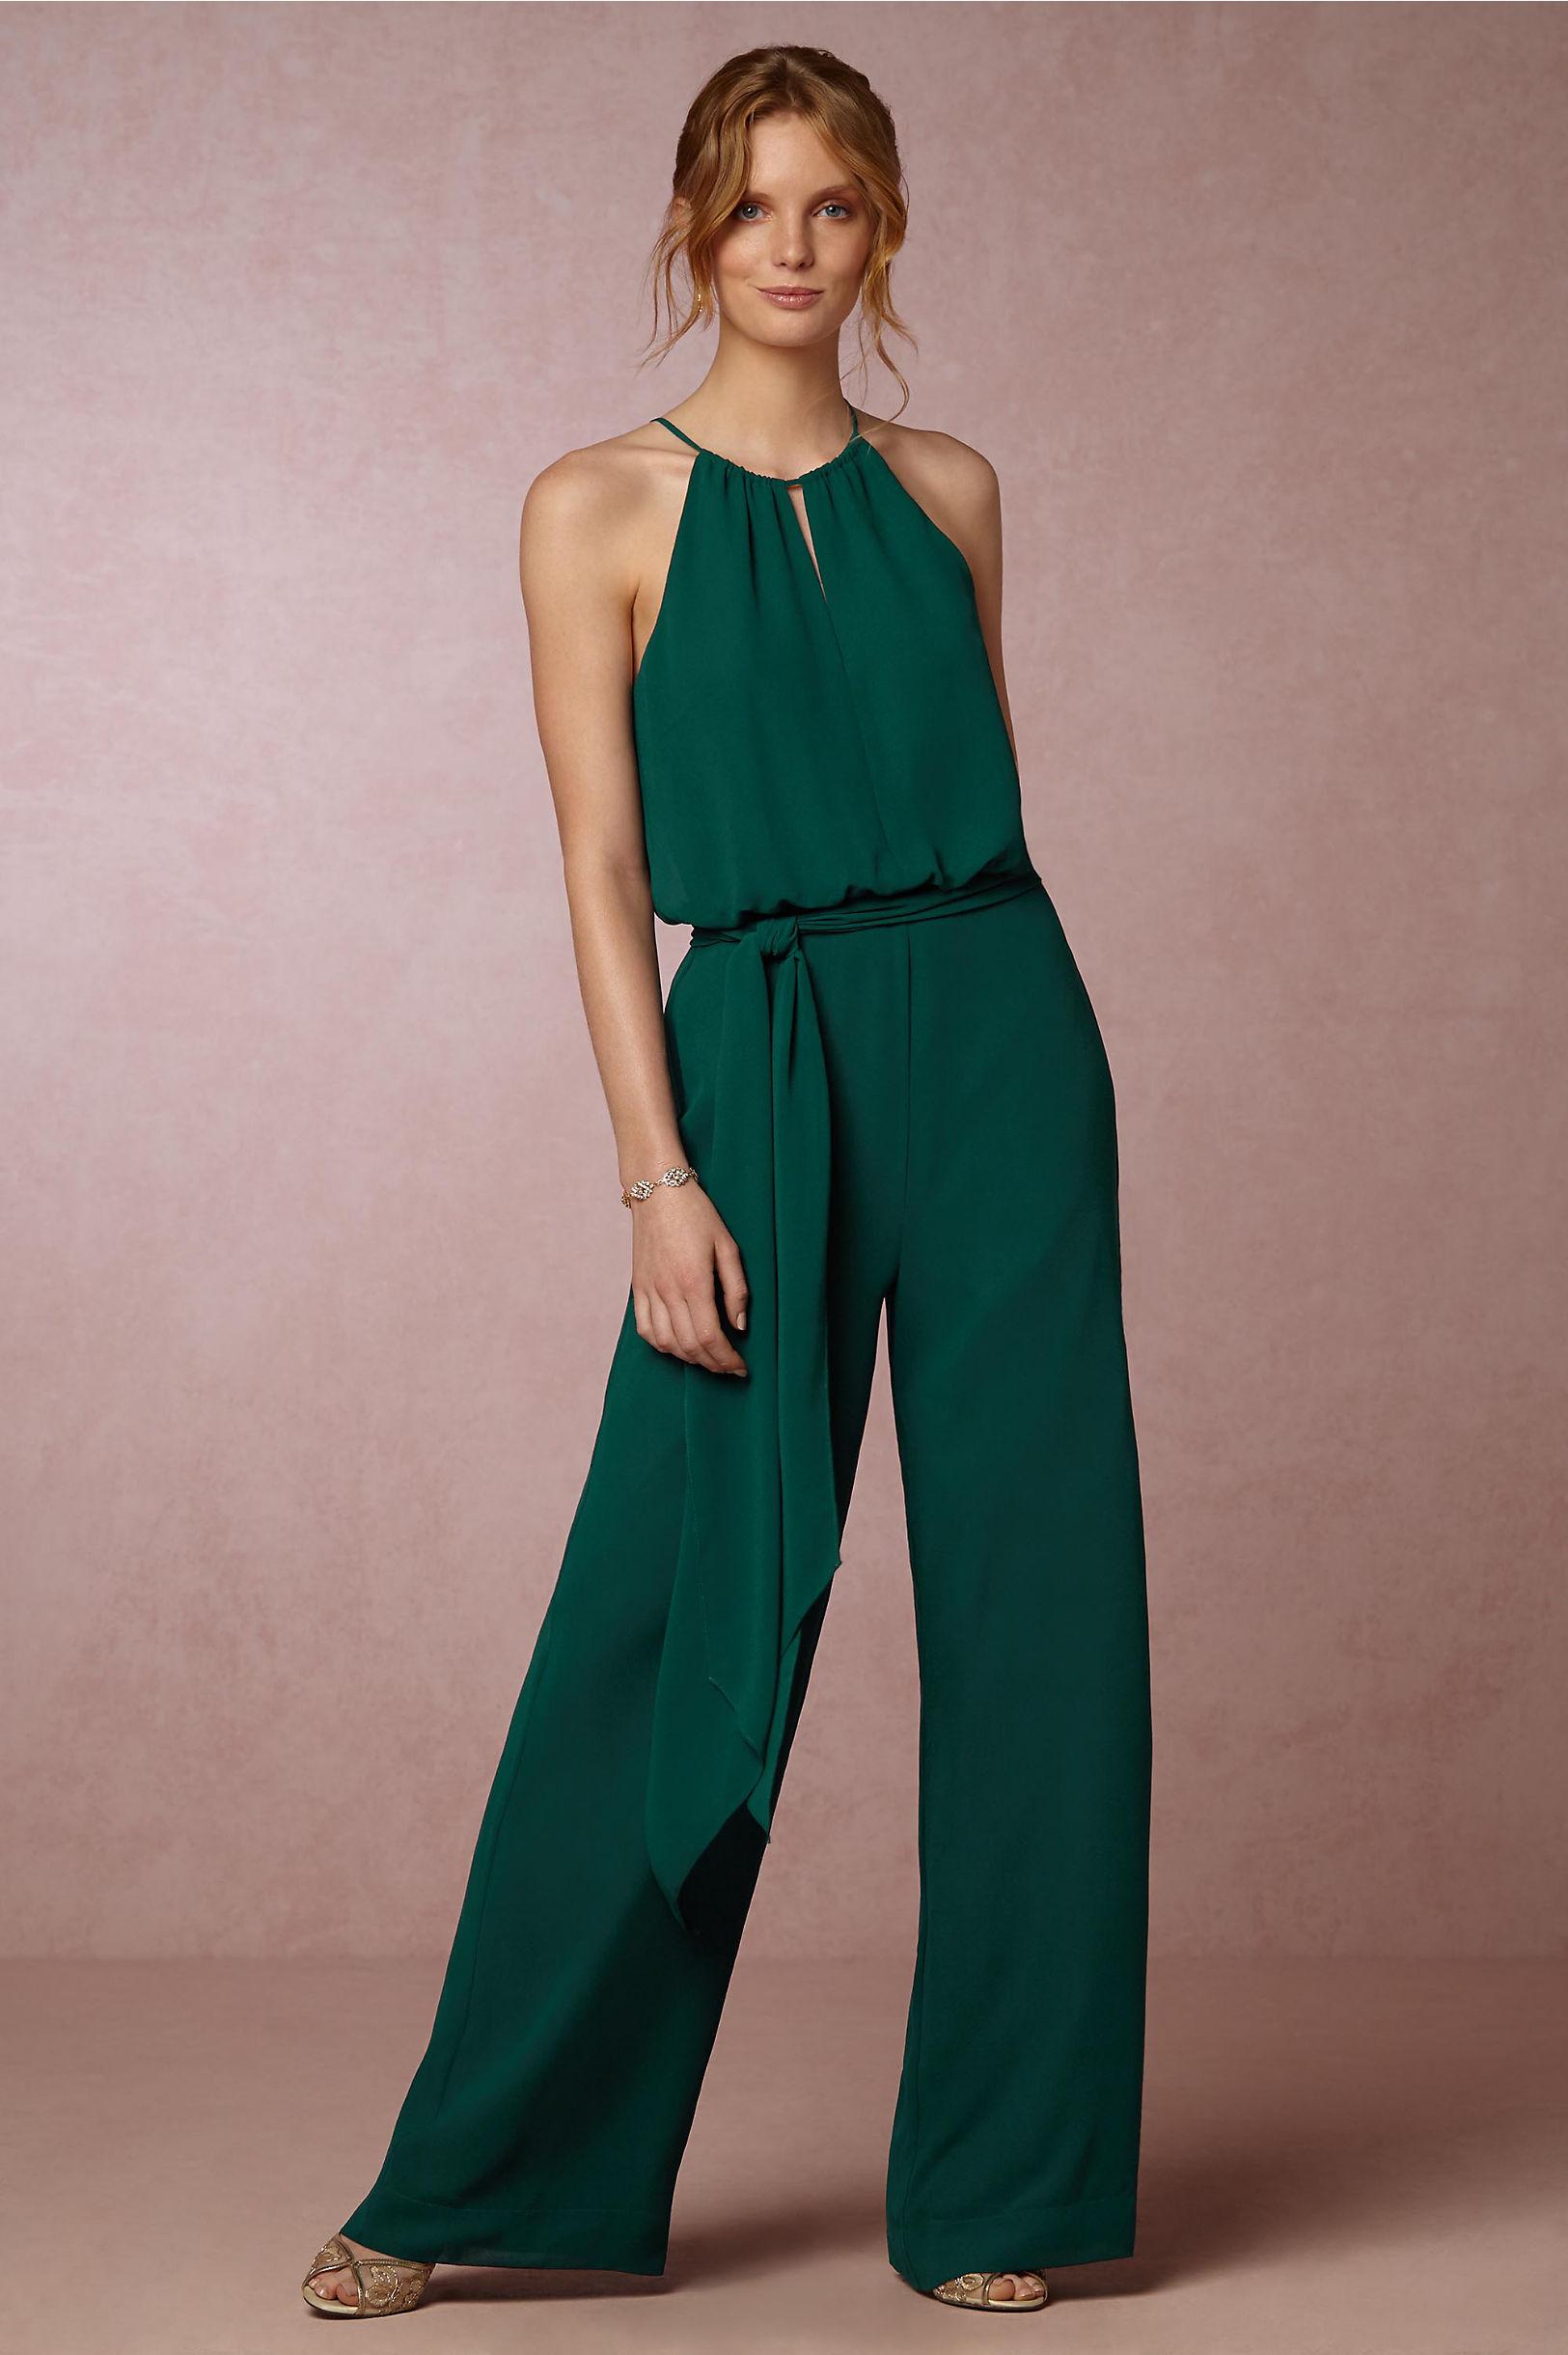 Emerald Green Jumpsuit For Women Other Dresses Dressesss